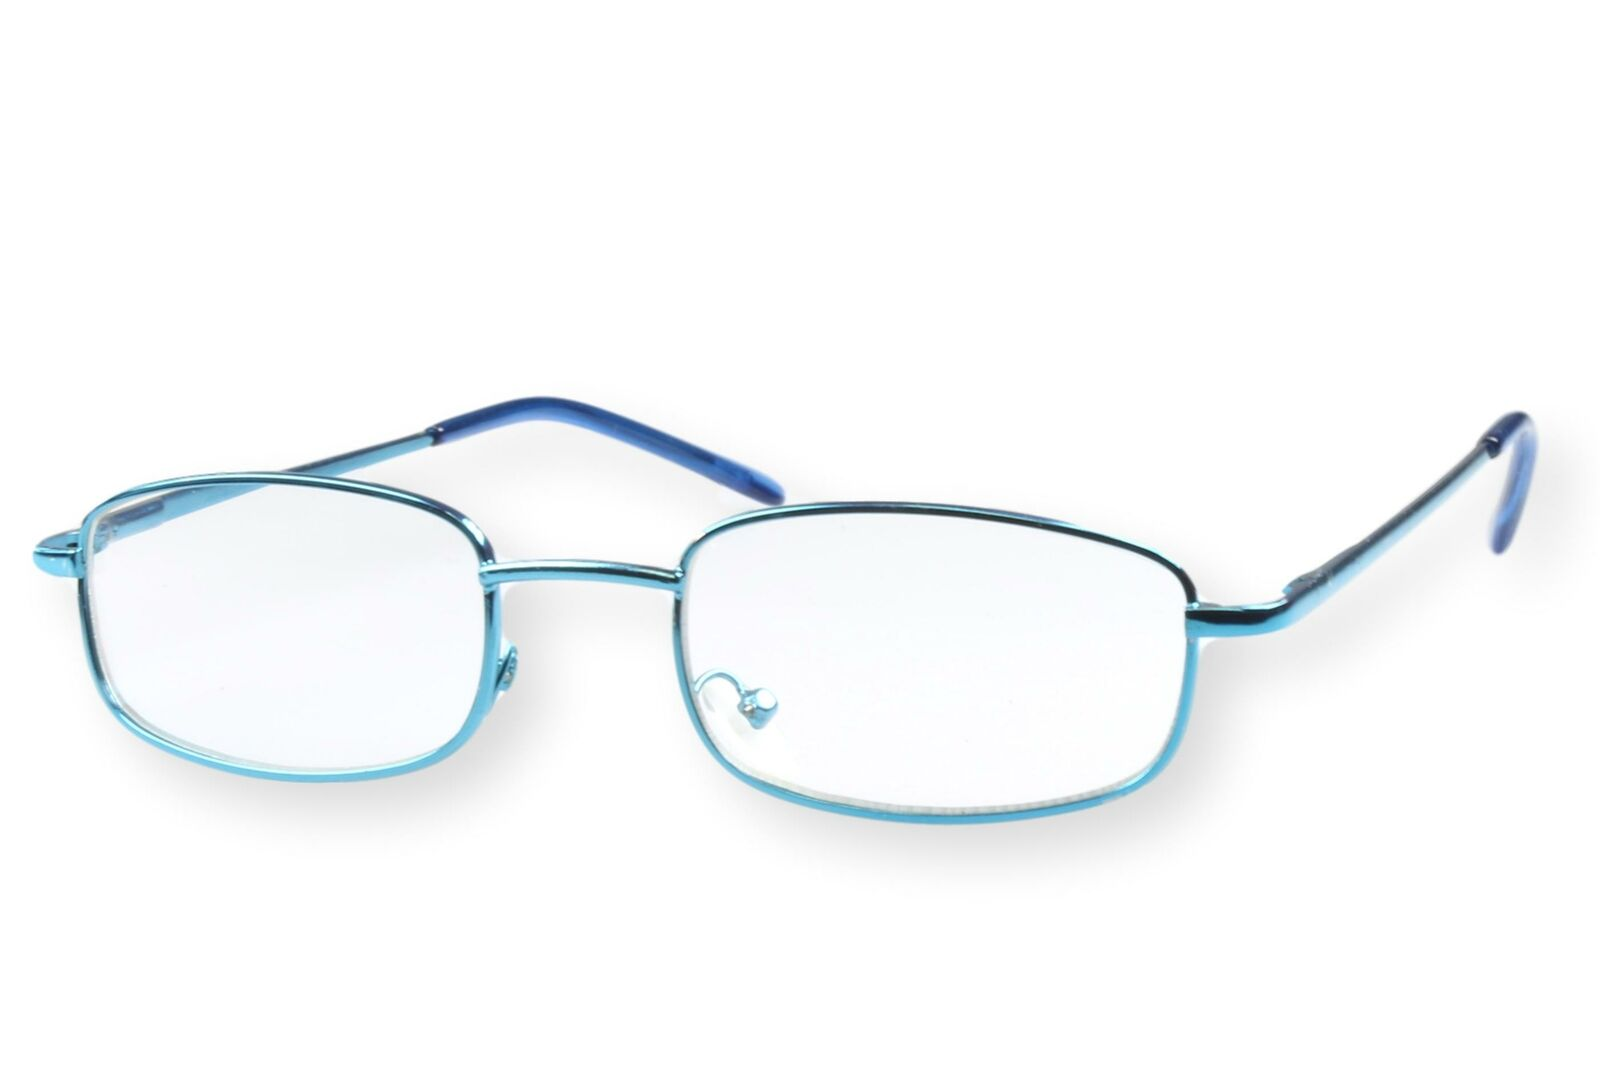 Lesebrille Herren Metall blau dünner schmaler Rahmen stabil Federbügel leicht